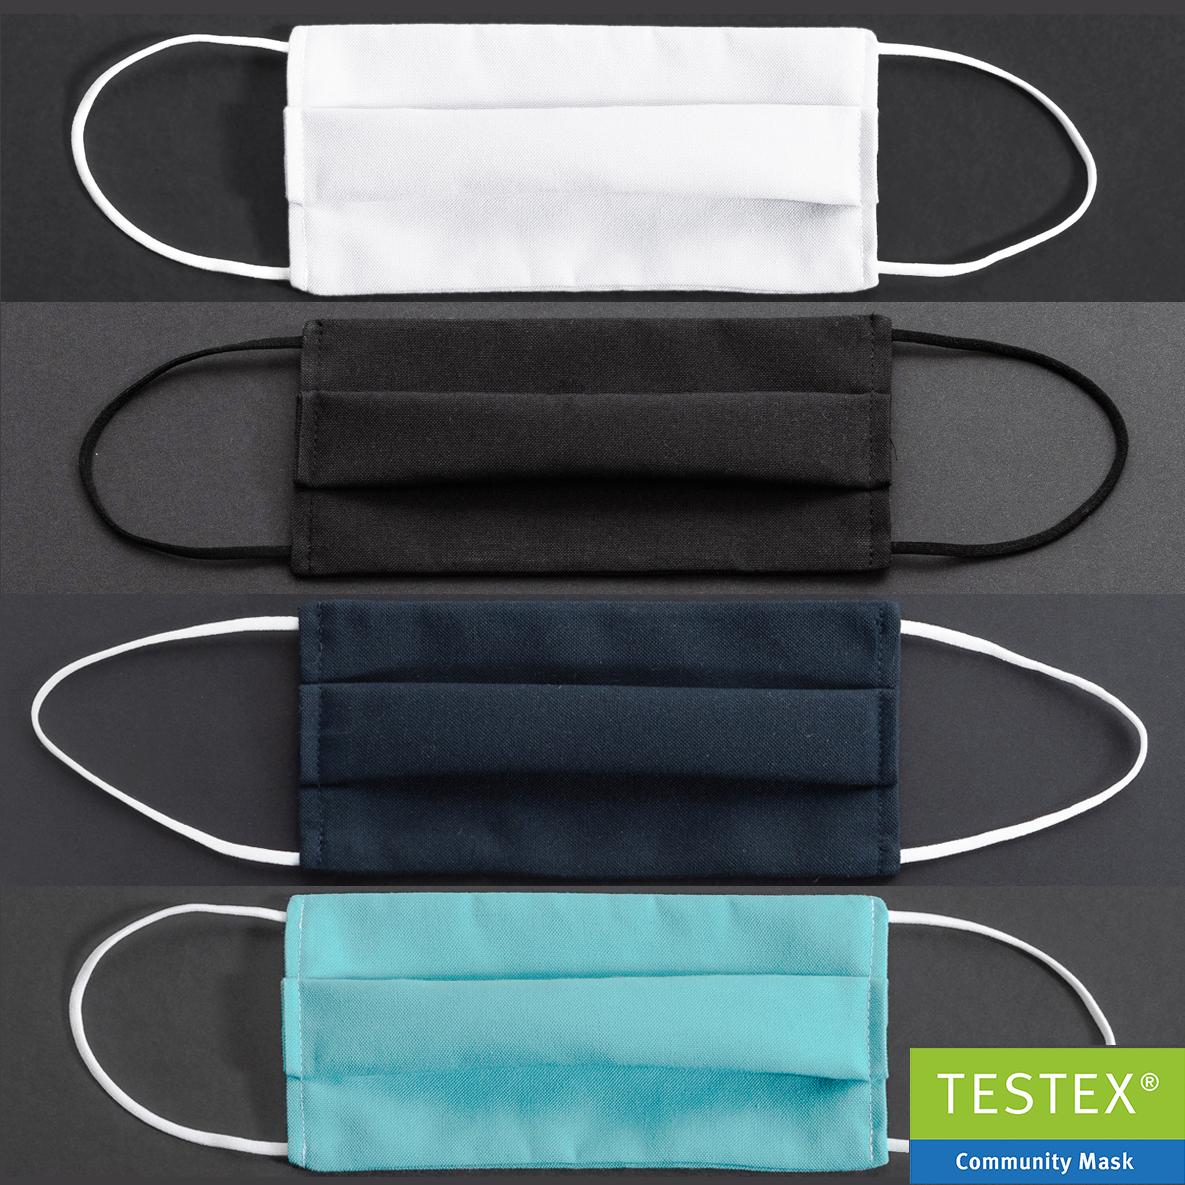 Empa-geprüfte Community-Maske Polyester uni in 4 Varianten - 1 Stück